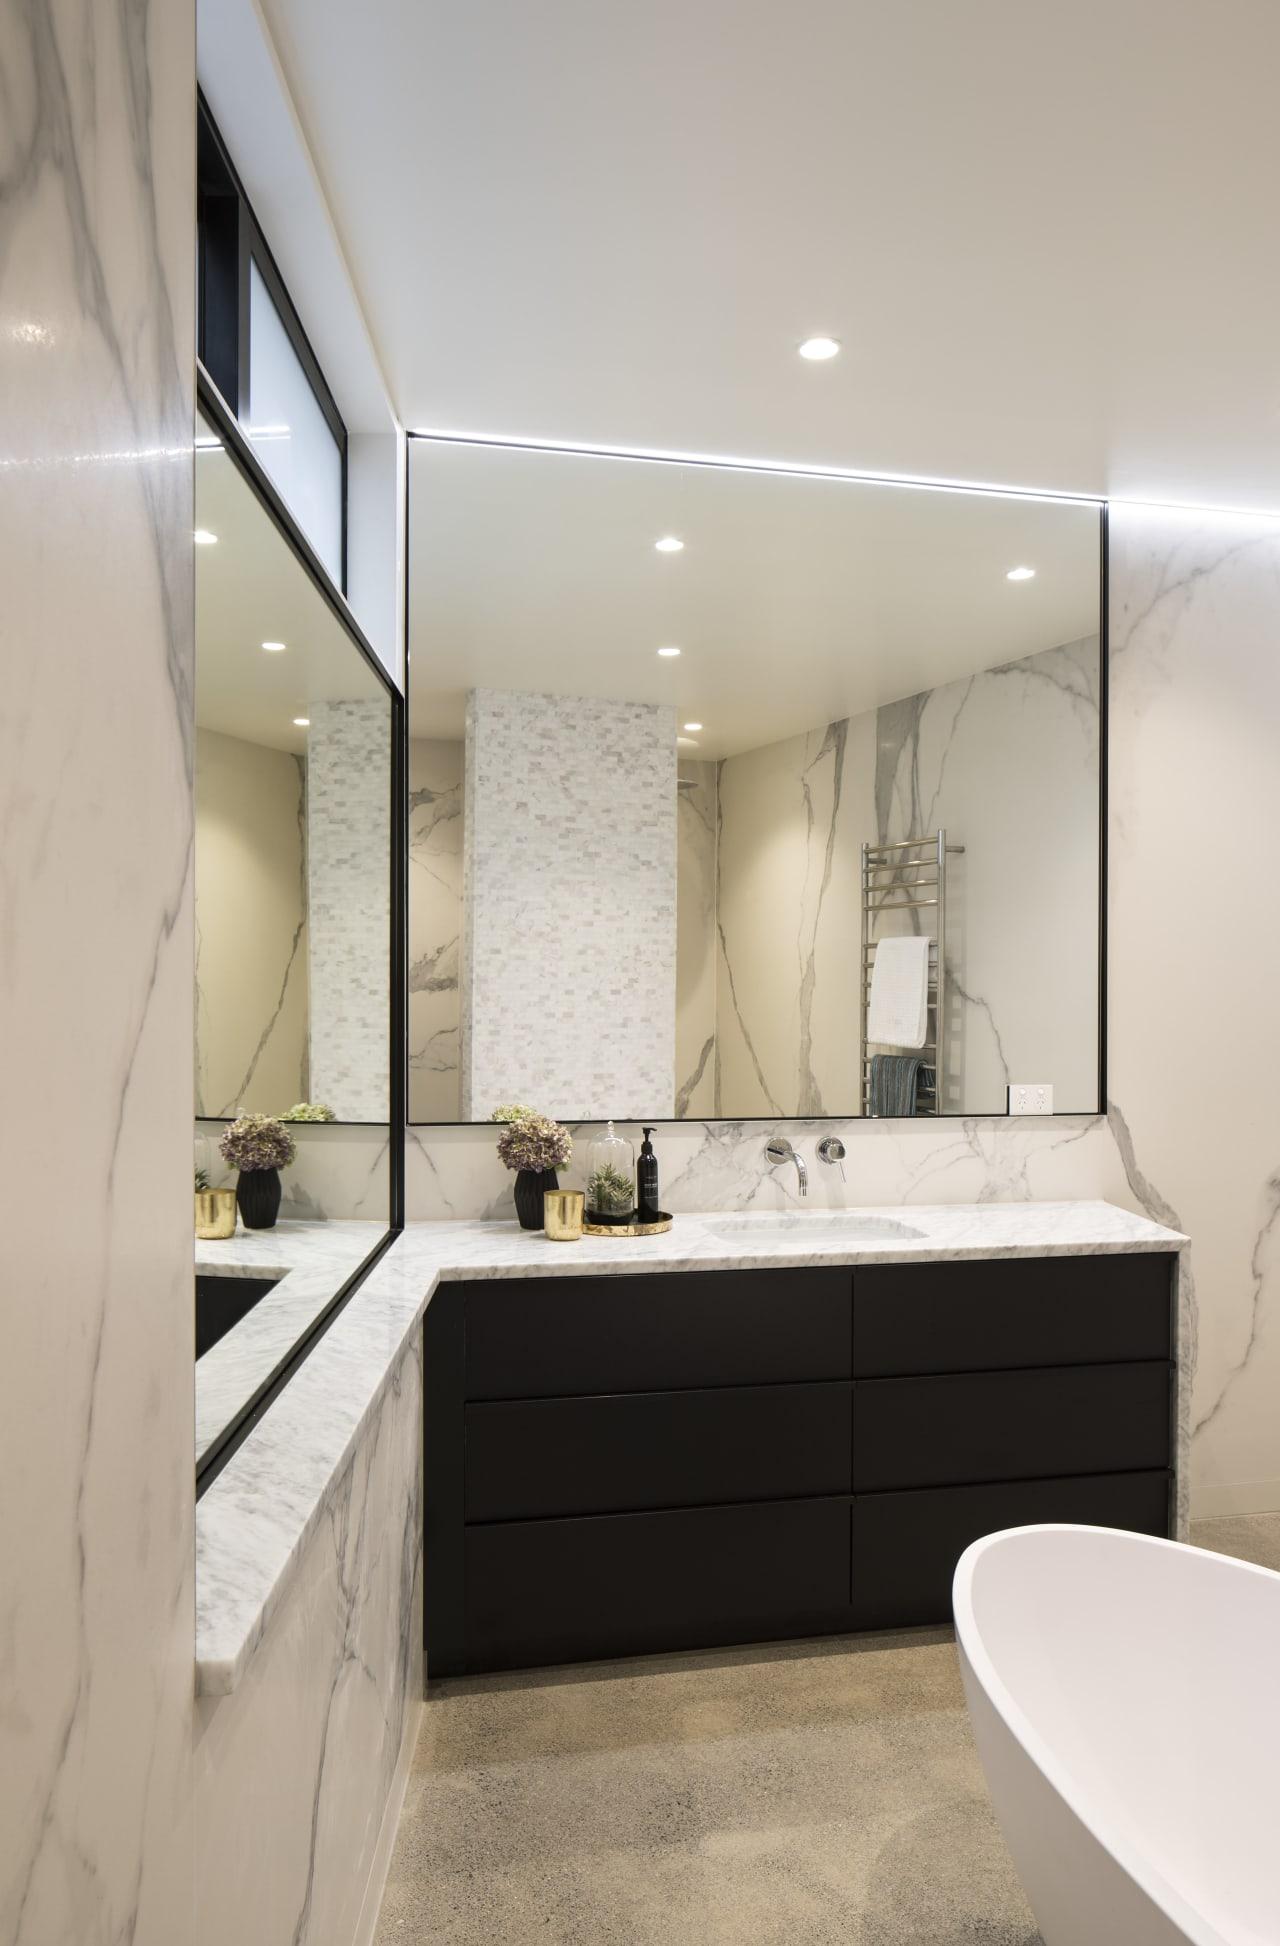 Spa Like Master Bathroom Combines Modern Function Trends